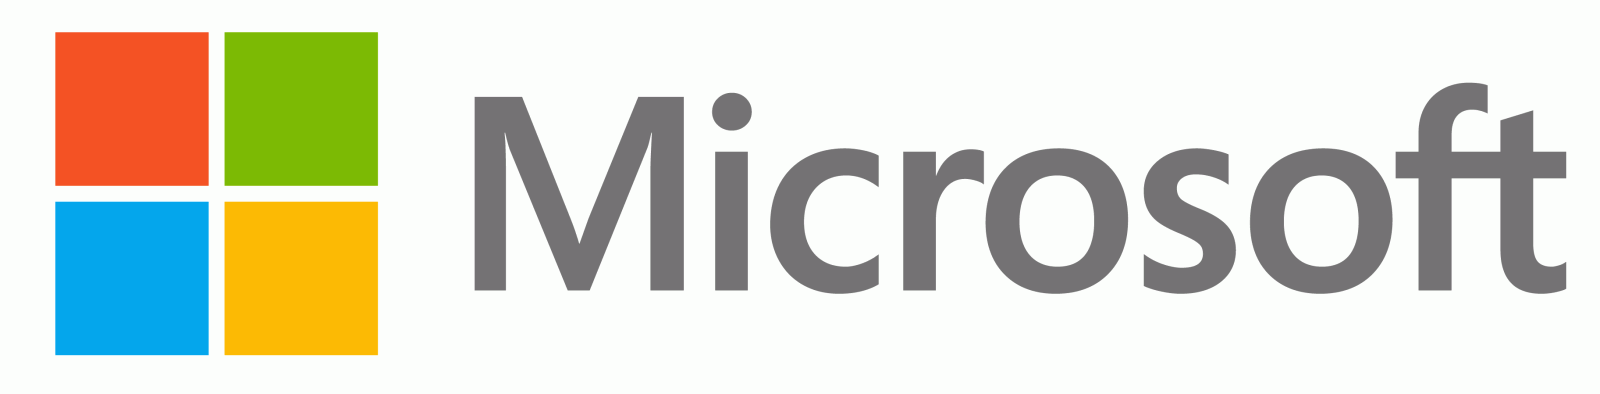 microsft